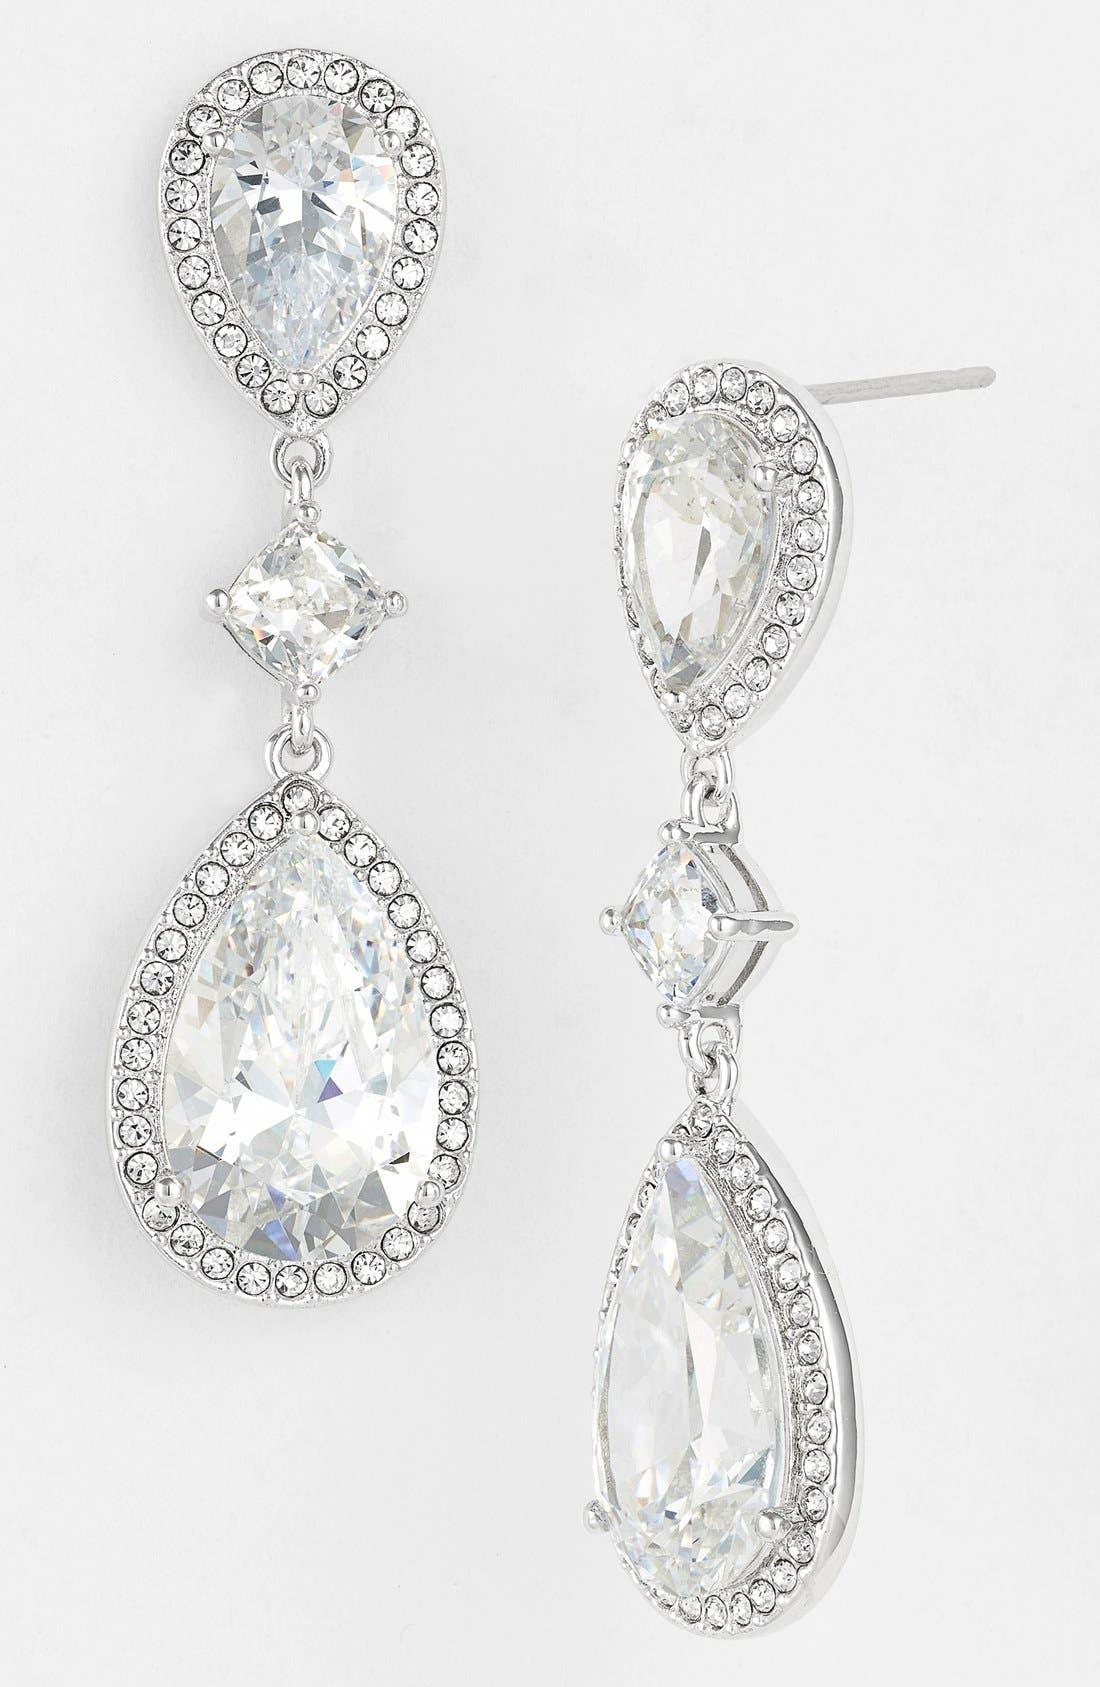 Cubic Zirconia Drop Earrings,                             Main thumbnail 1, color,                             Silver